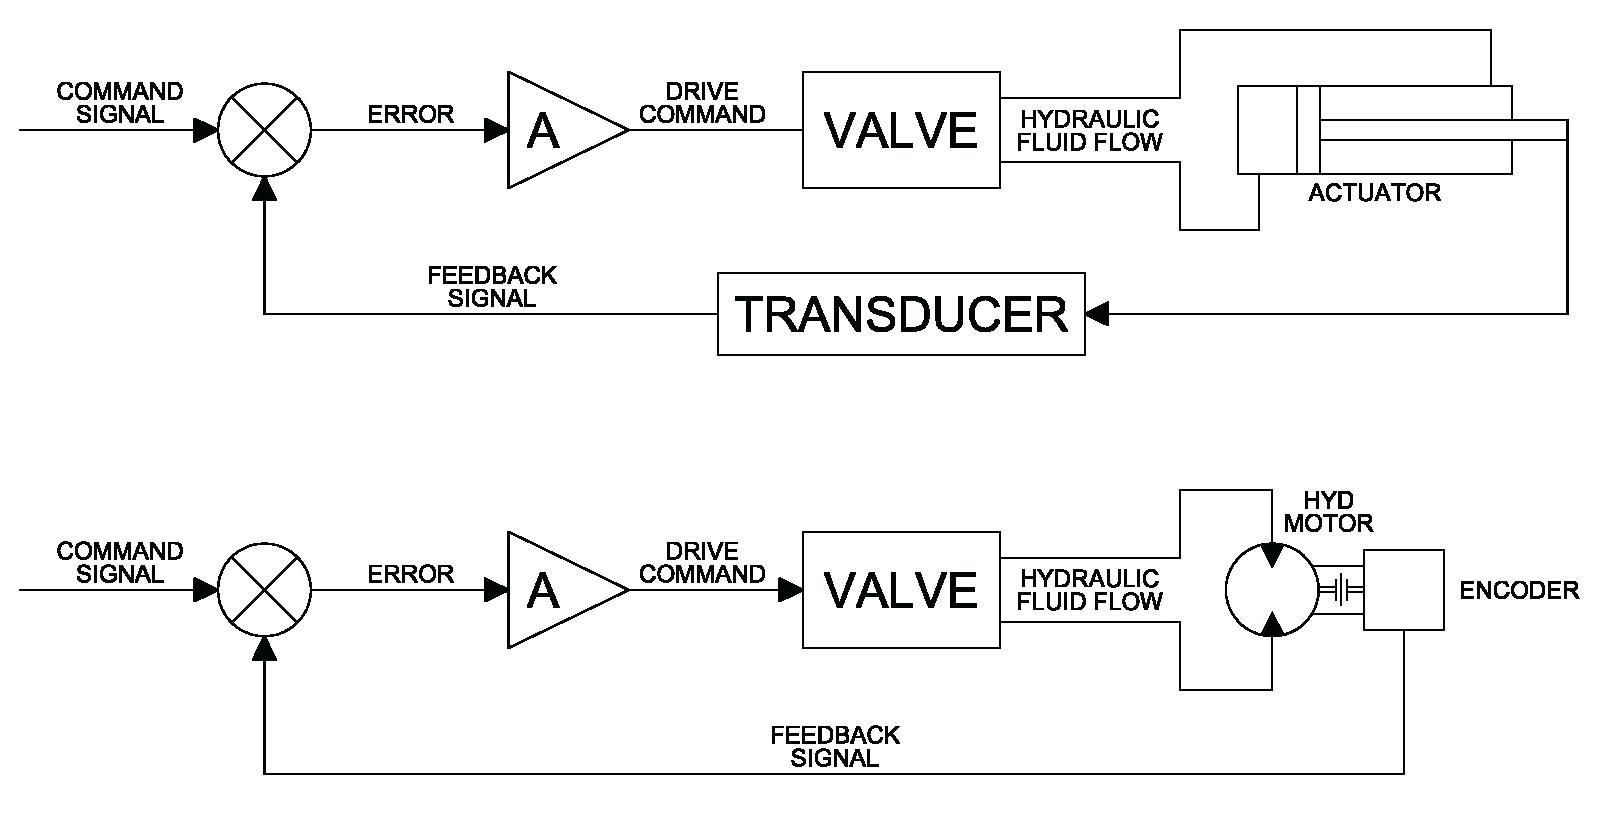 asco red hat 8316g064 wiring diagram emerson 4 way tele redhat 2 free